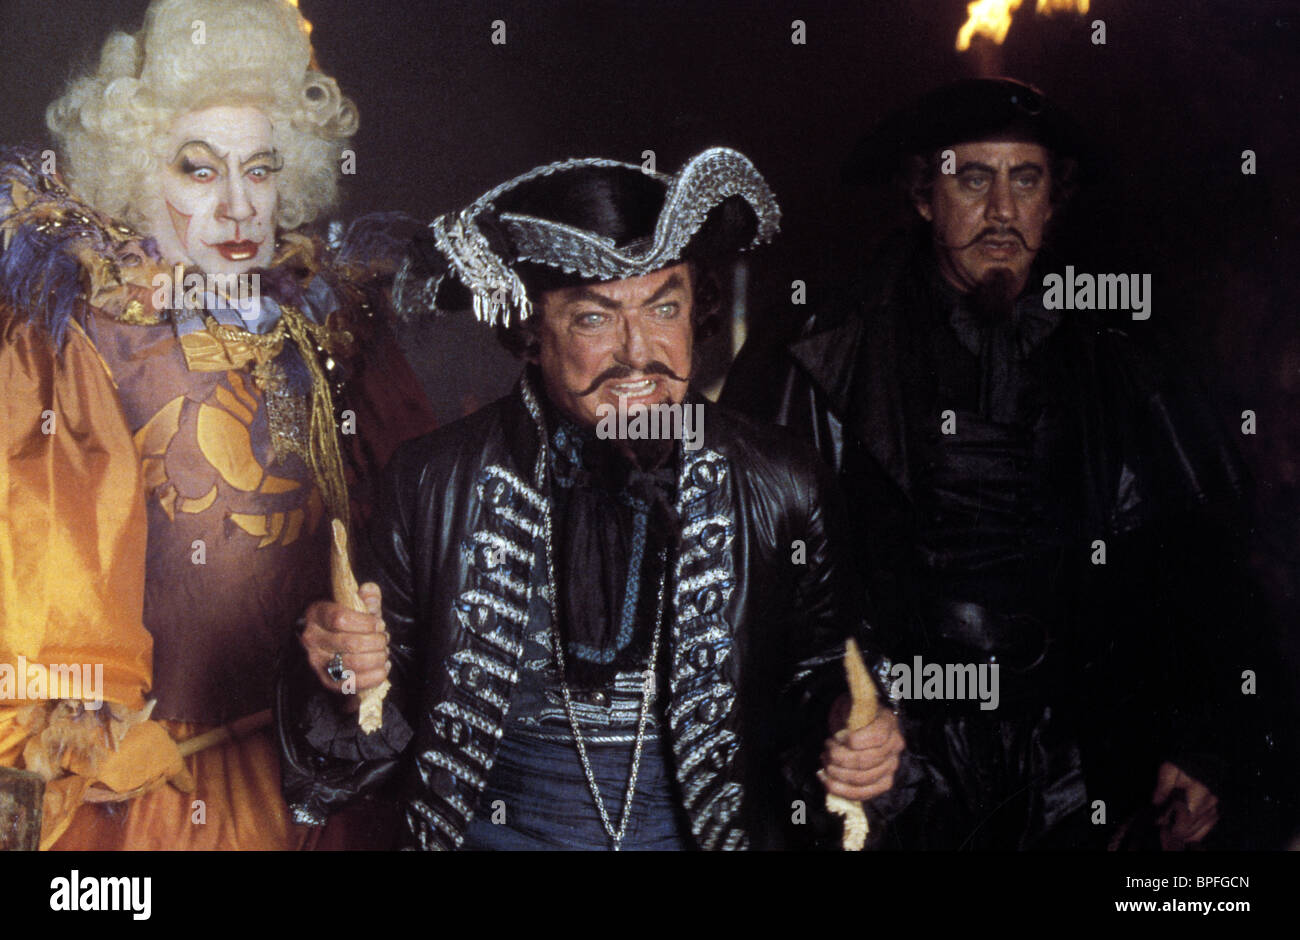 UDO KIER THE ADVENTURES OF PINOCCHIO (1996 Stock Photo ...